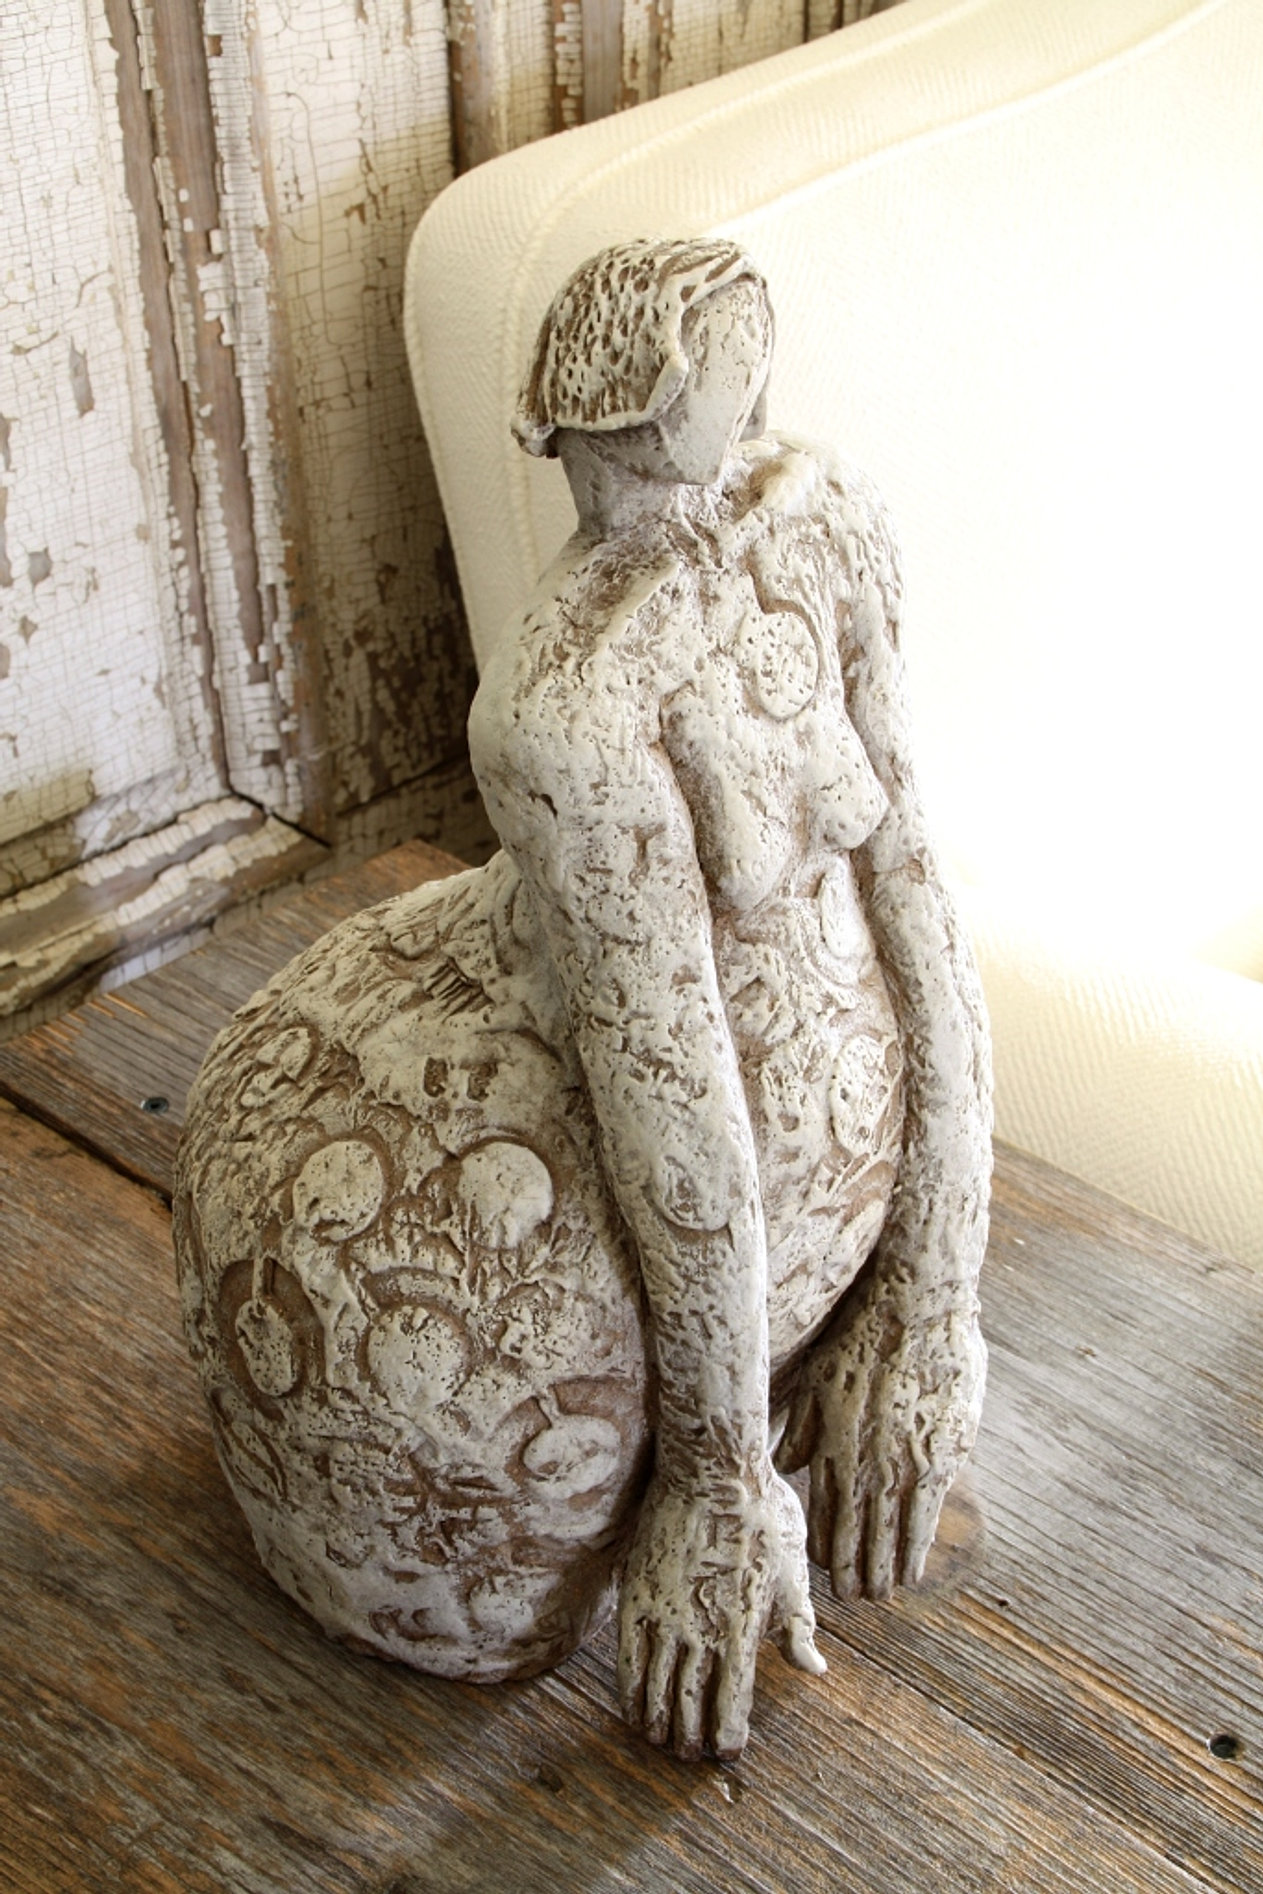 Sculpture by Linda Williams